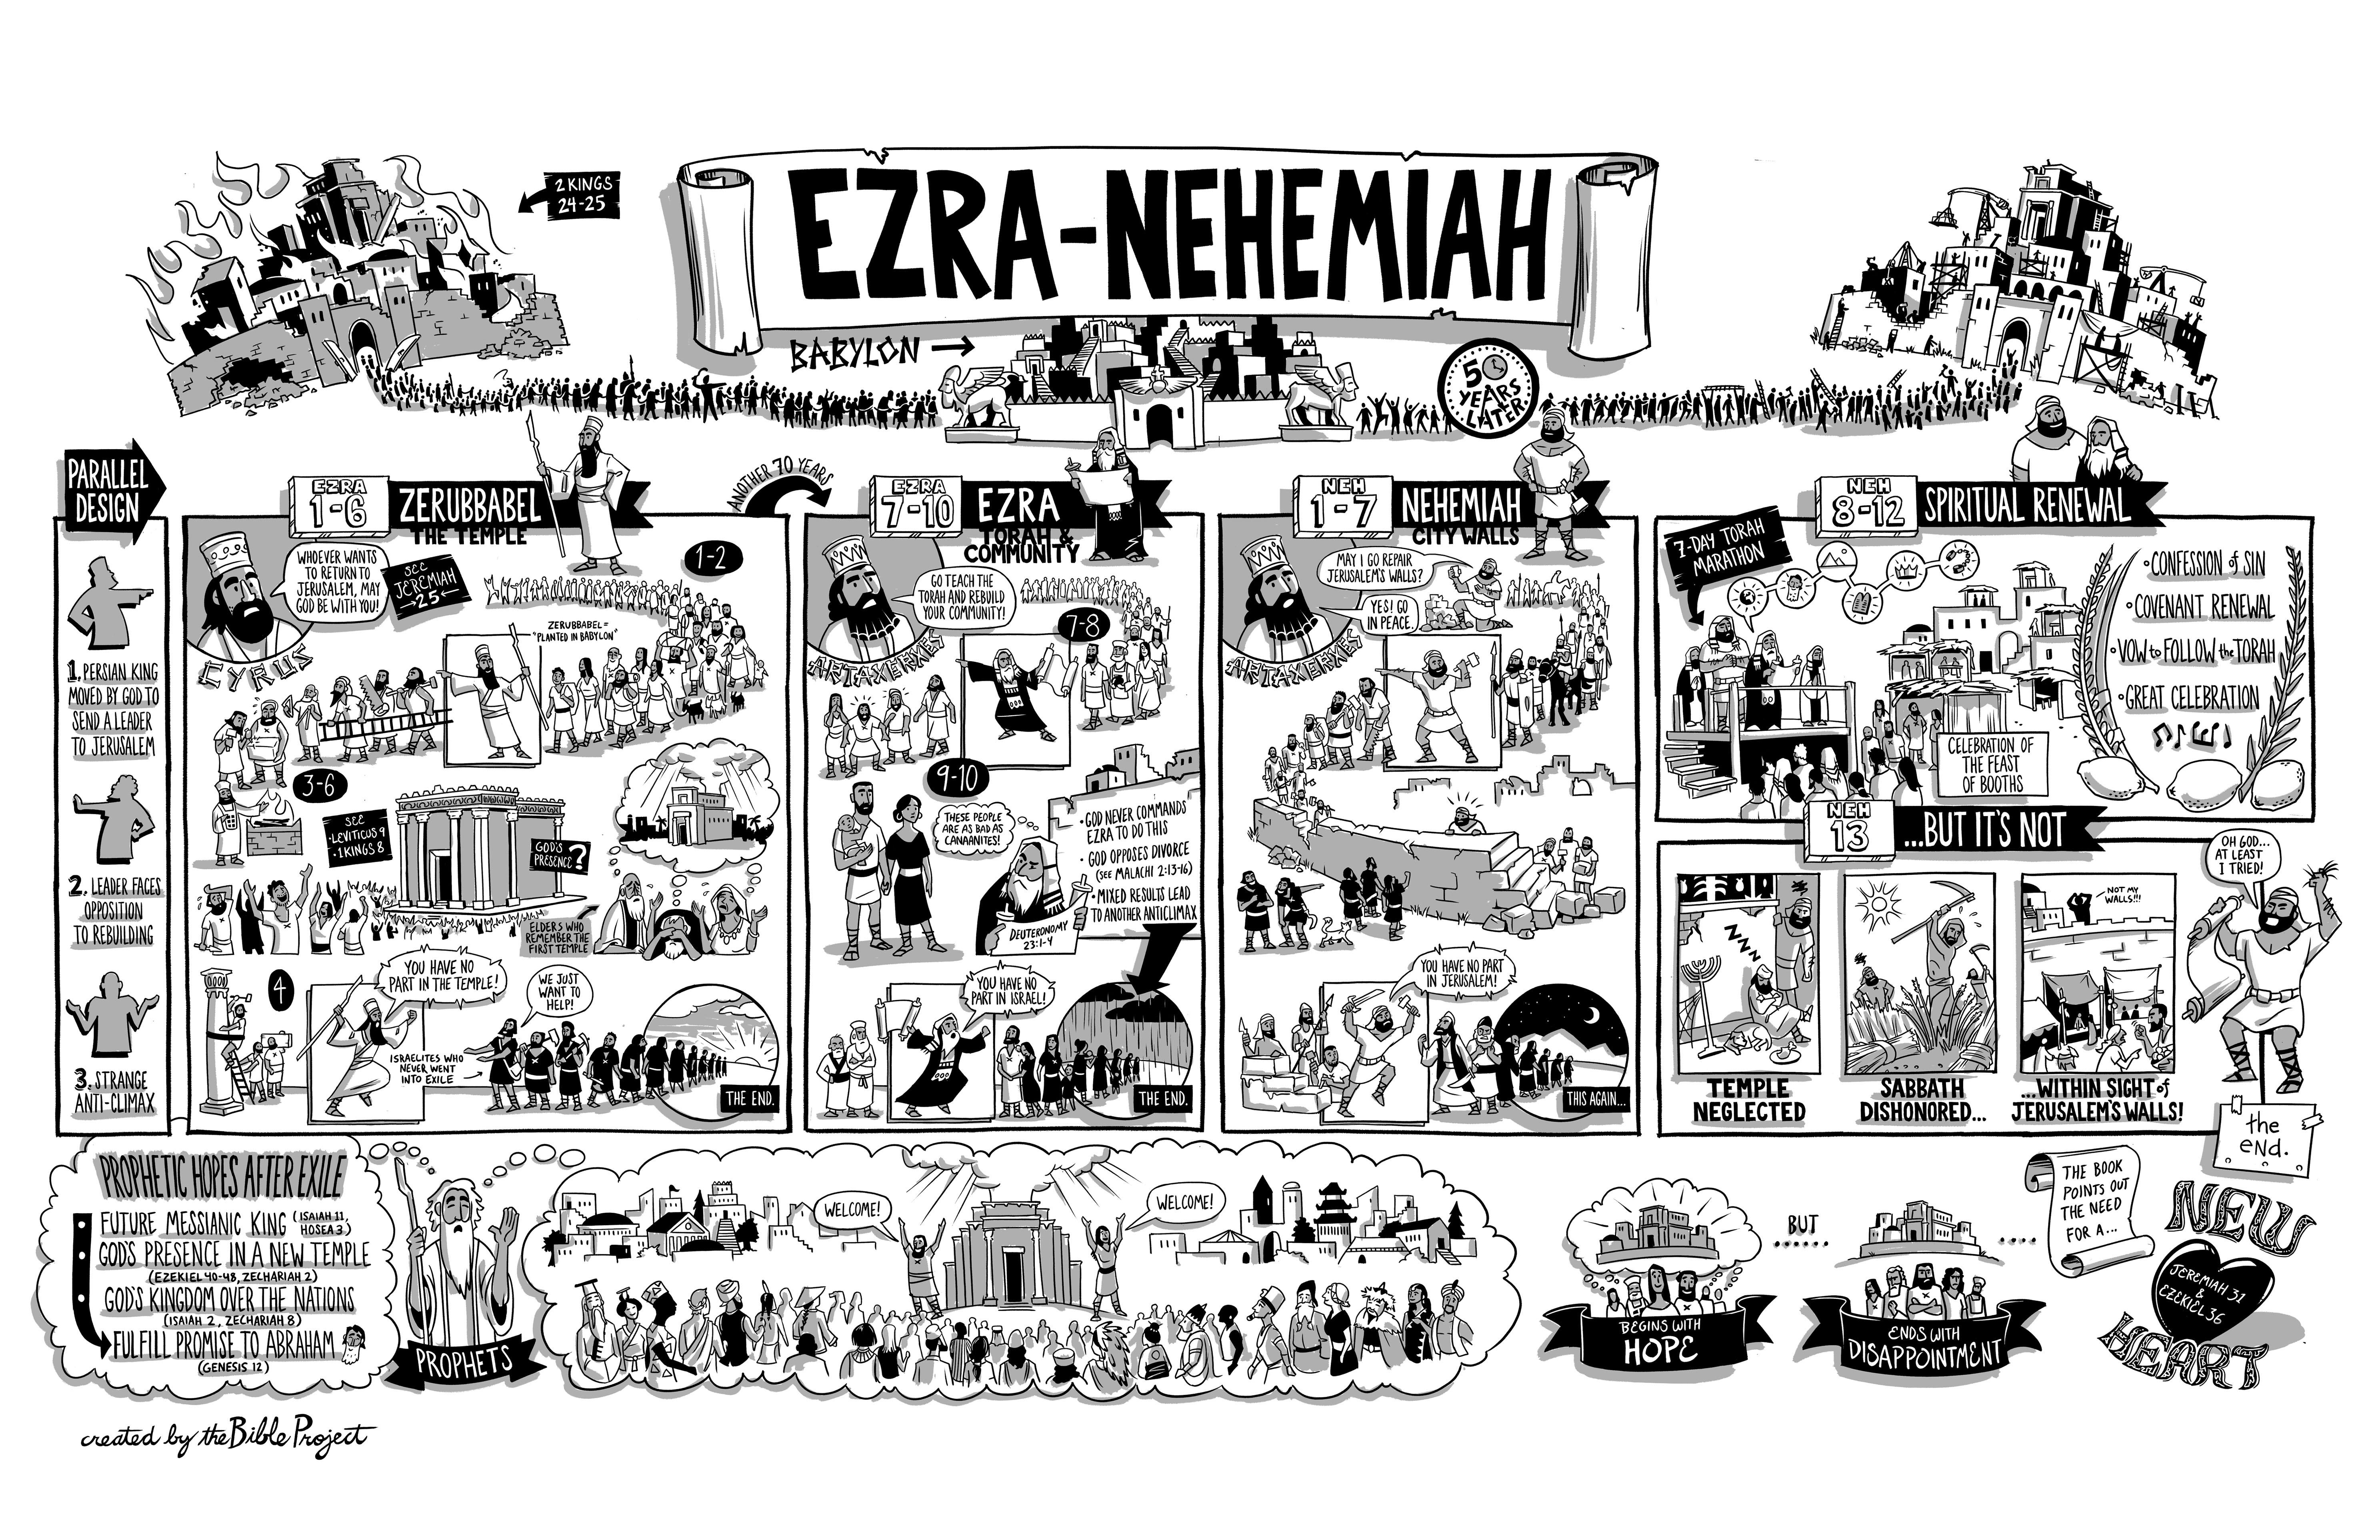 Ezra-Nehemiah - Poster (JPG)